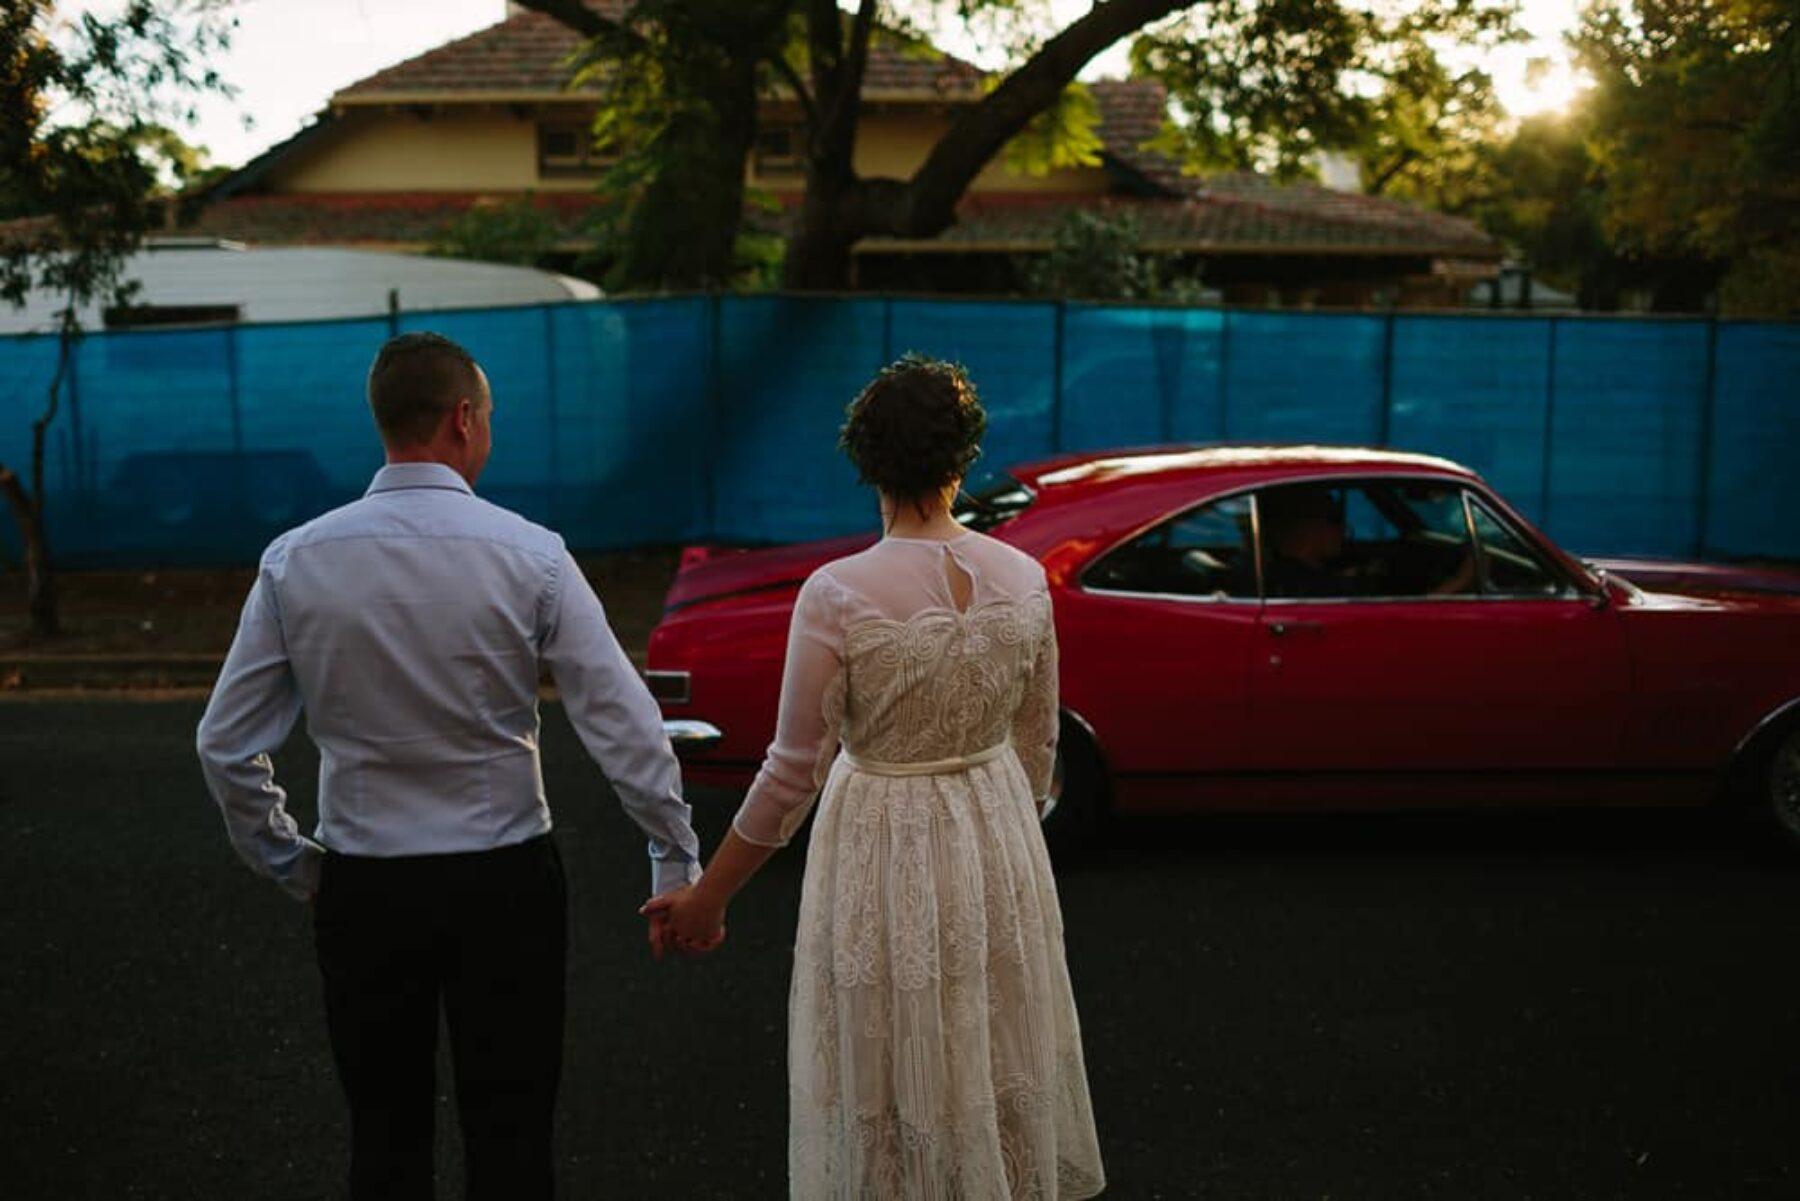 boho backyard wedding by Adeliade photographer Dave Pascoe